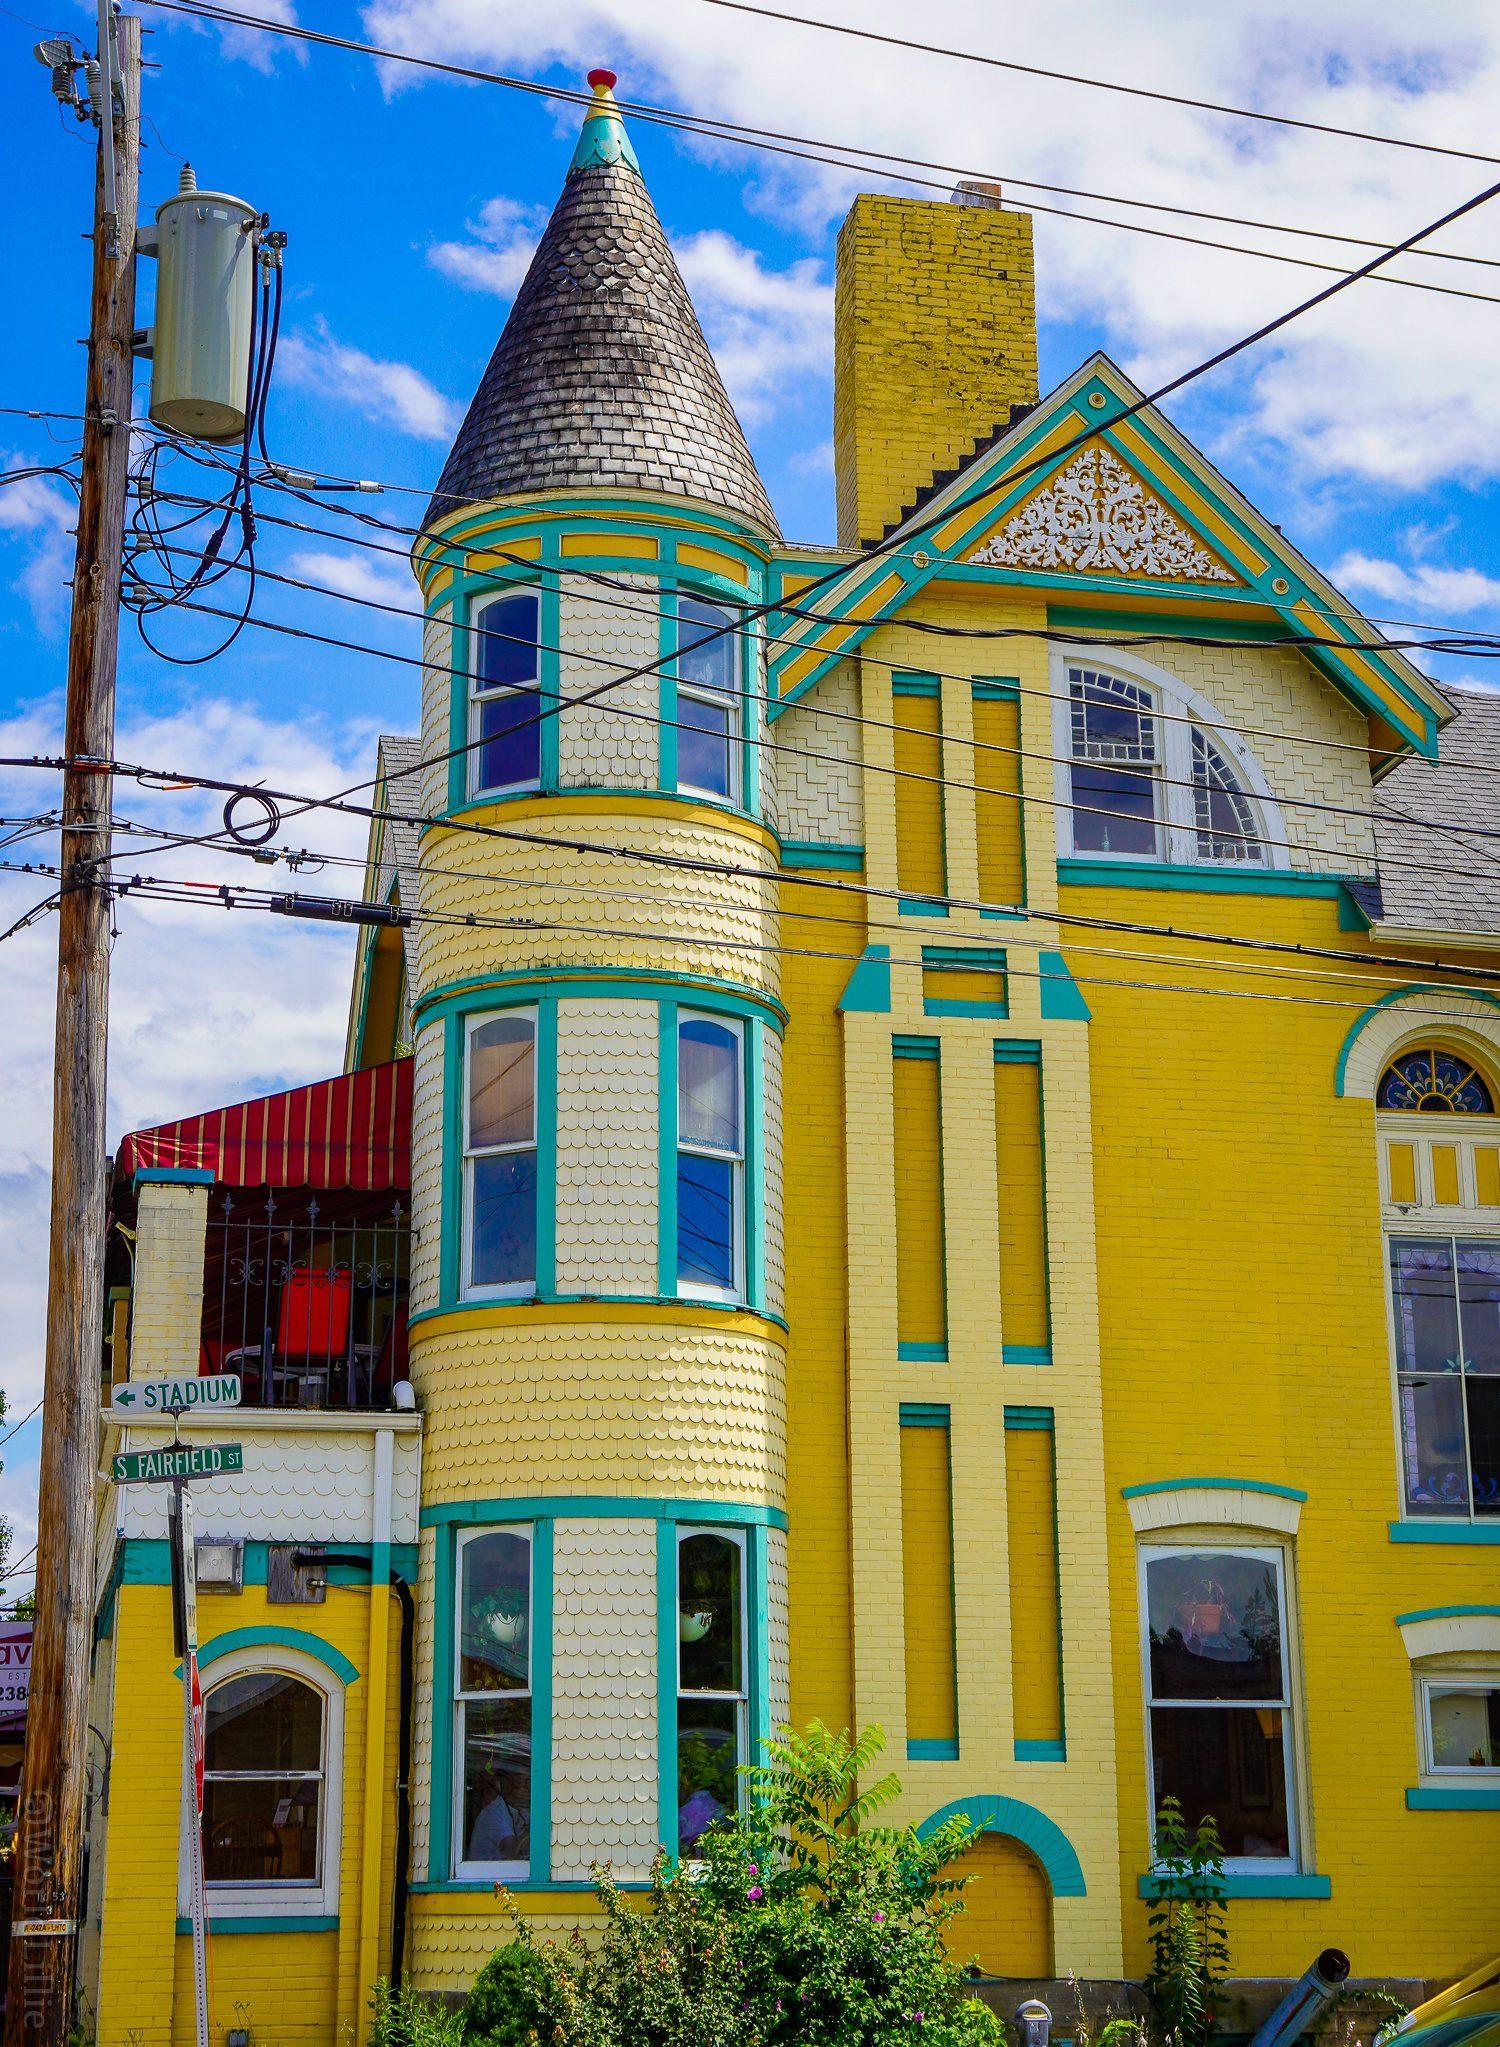 Ligonier's historic yellow building.